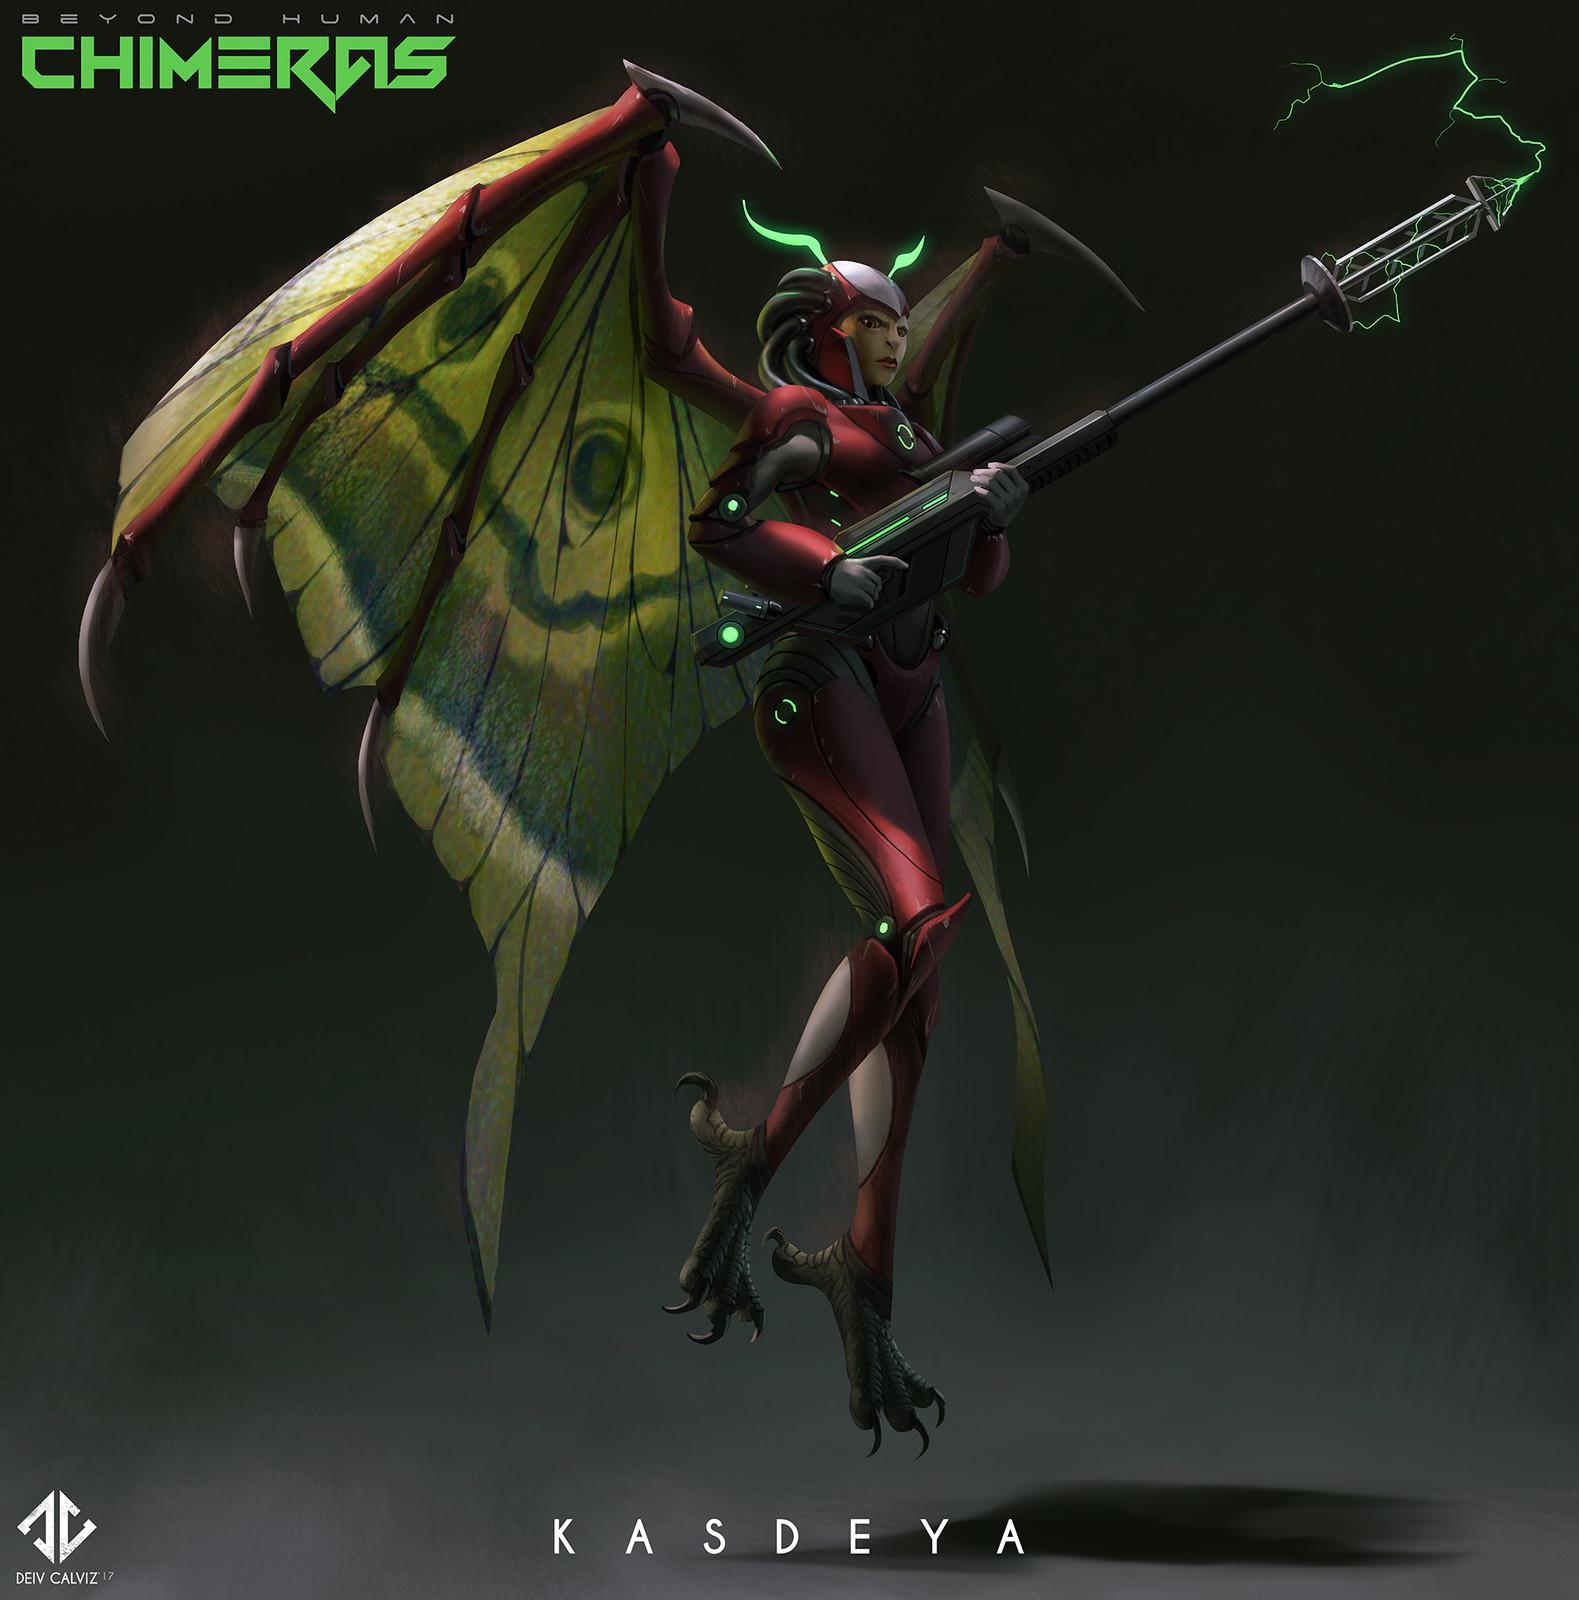 Kasdeya - Beyond Human